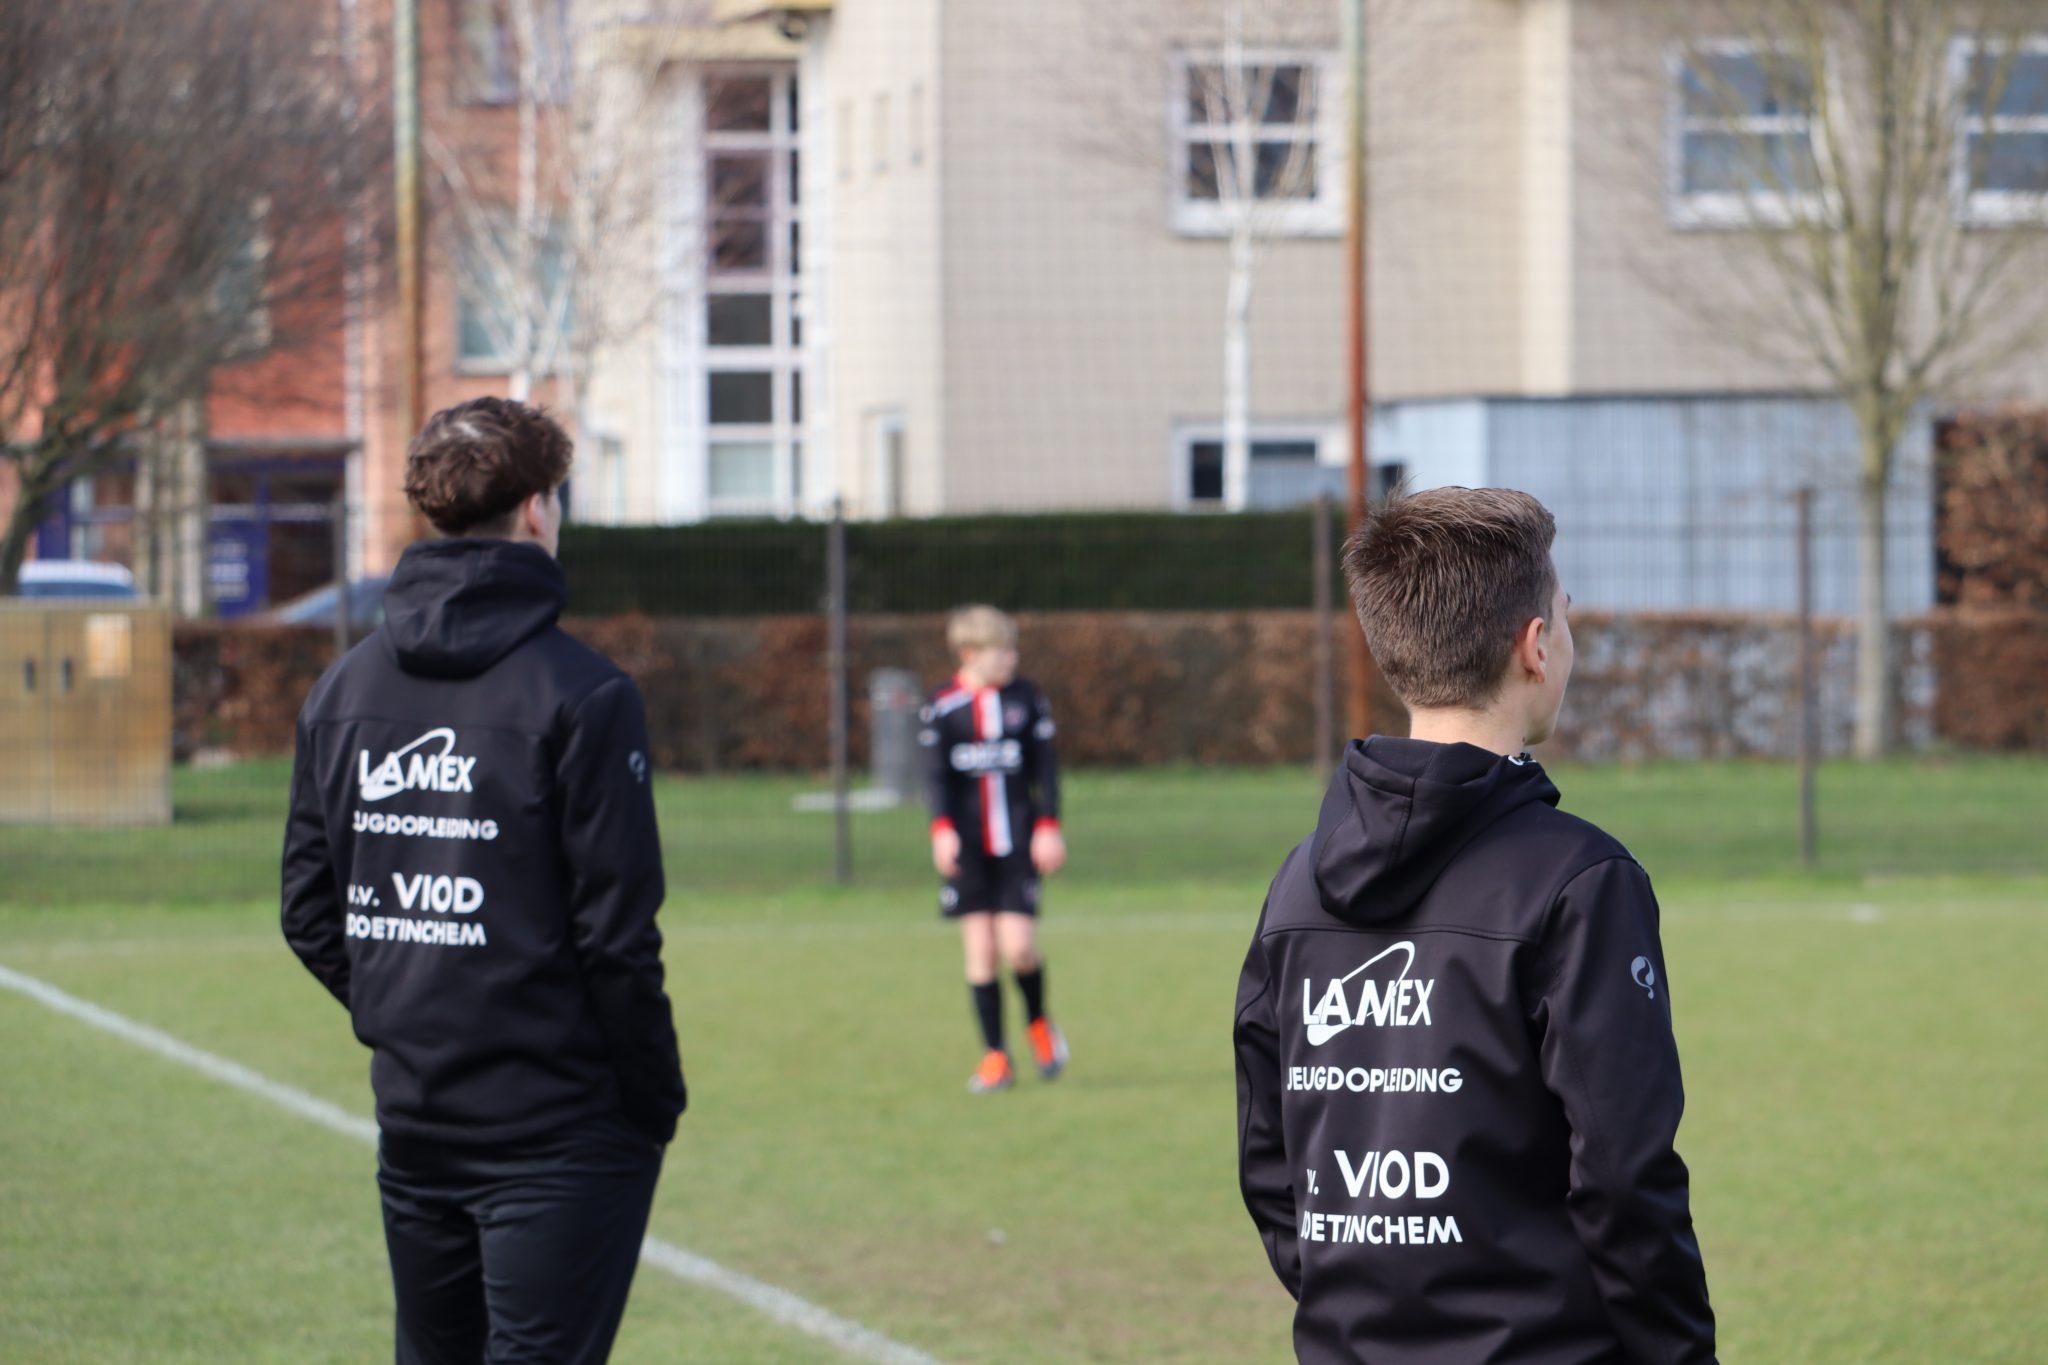 VIOD zoekt nieuwe jeugdtrainers